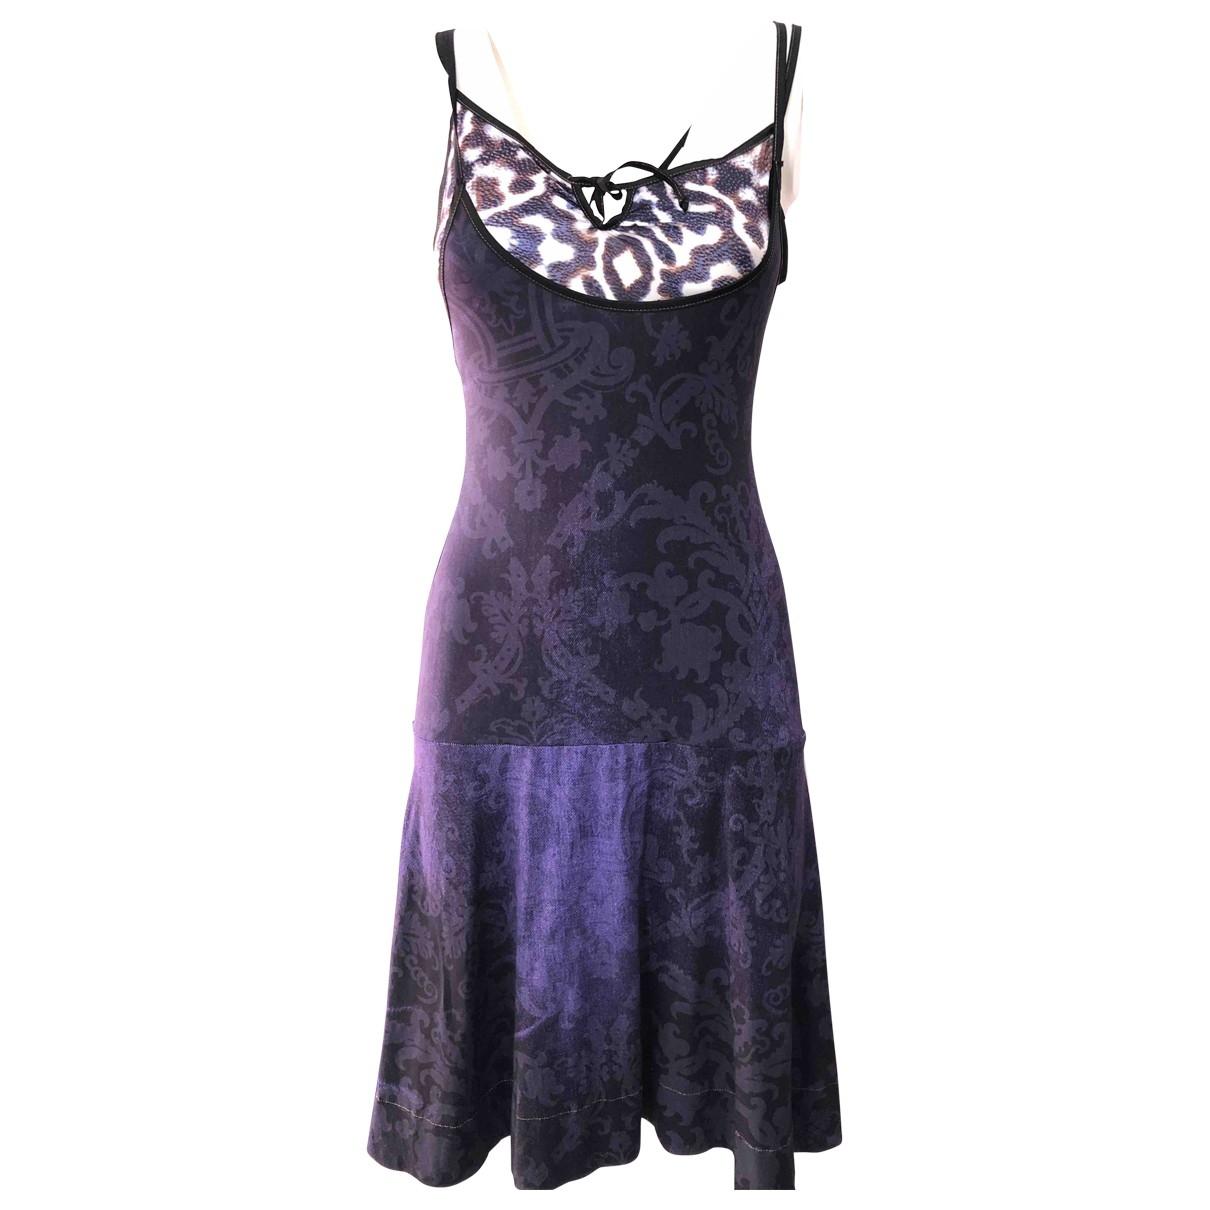 Just Cavalli \N Multicolour Cotton - elasthane dress for Women 40 IT